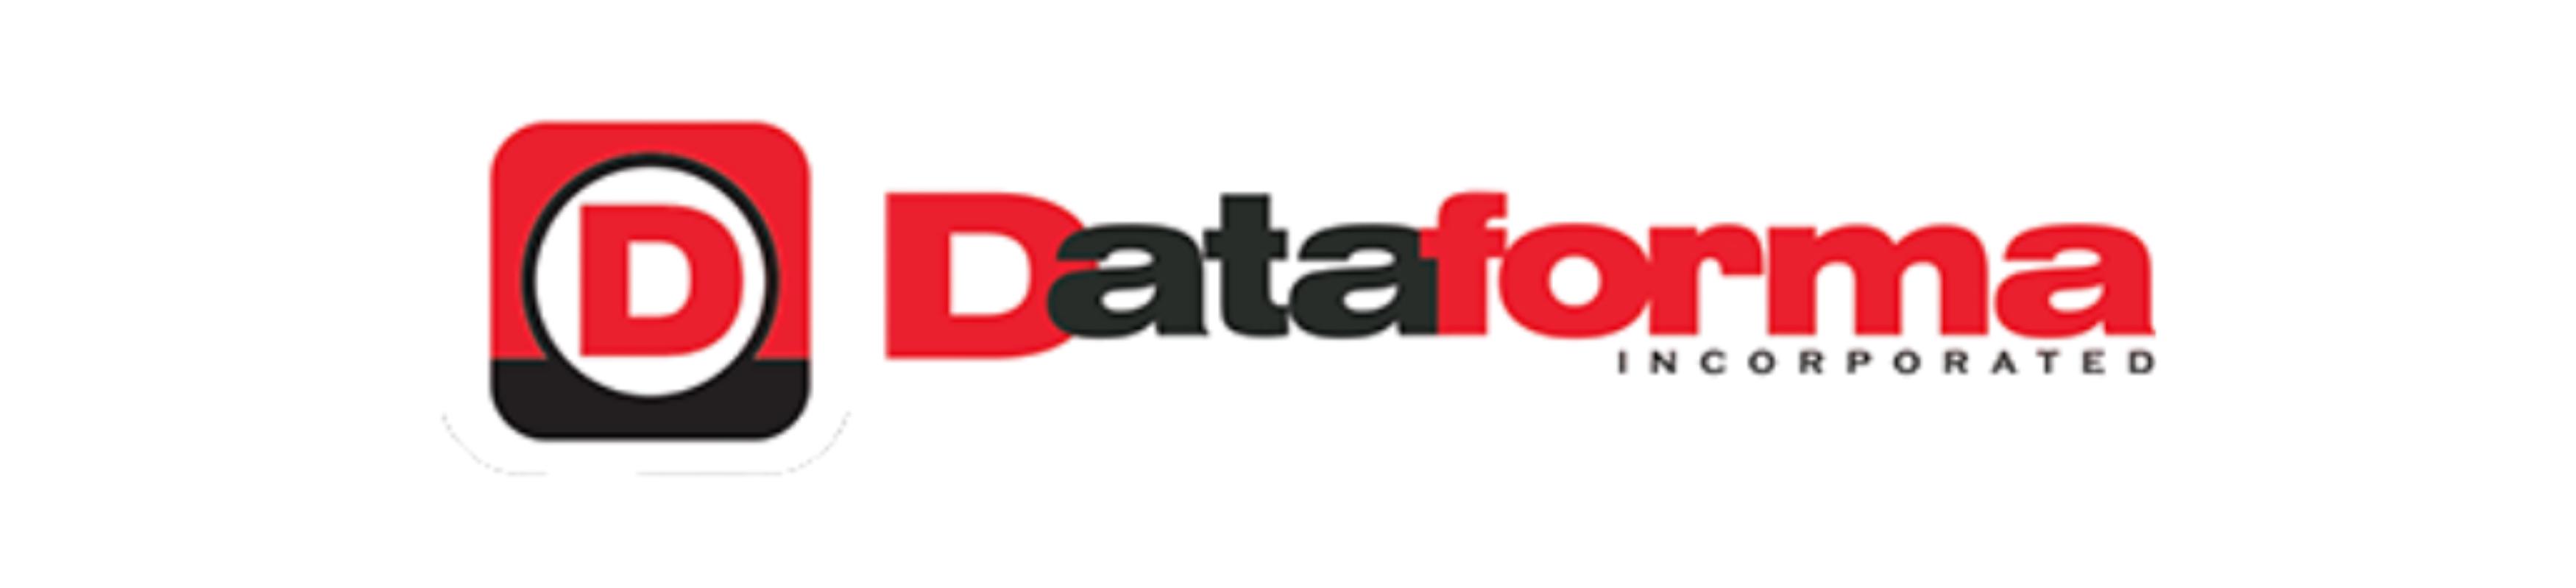 dataforma-followup-crm-integration